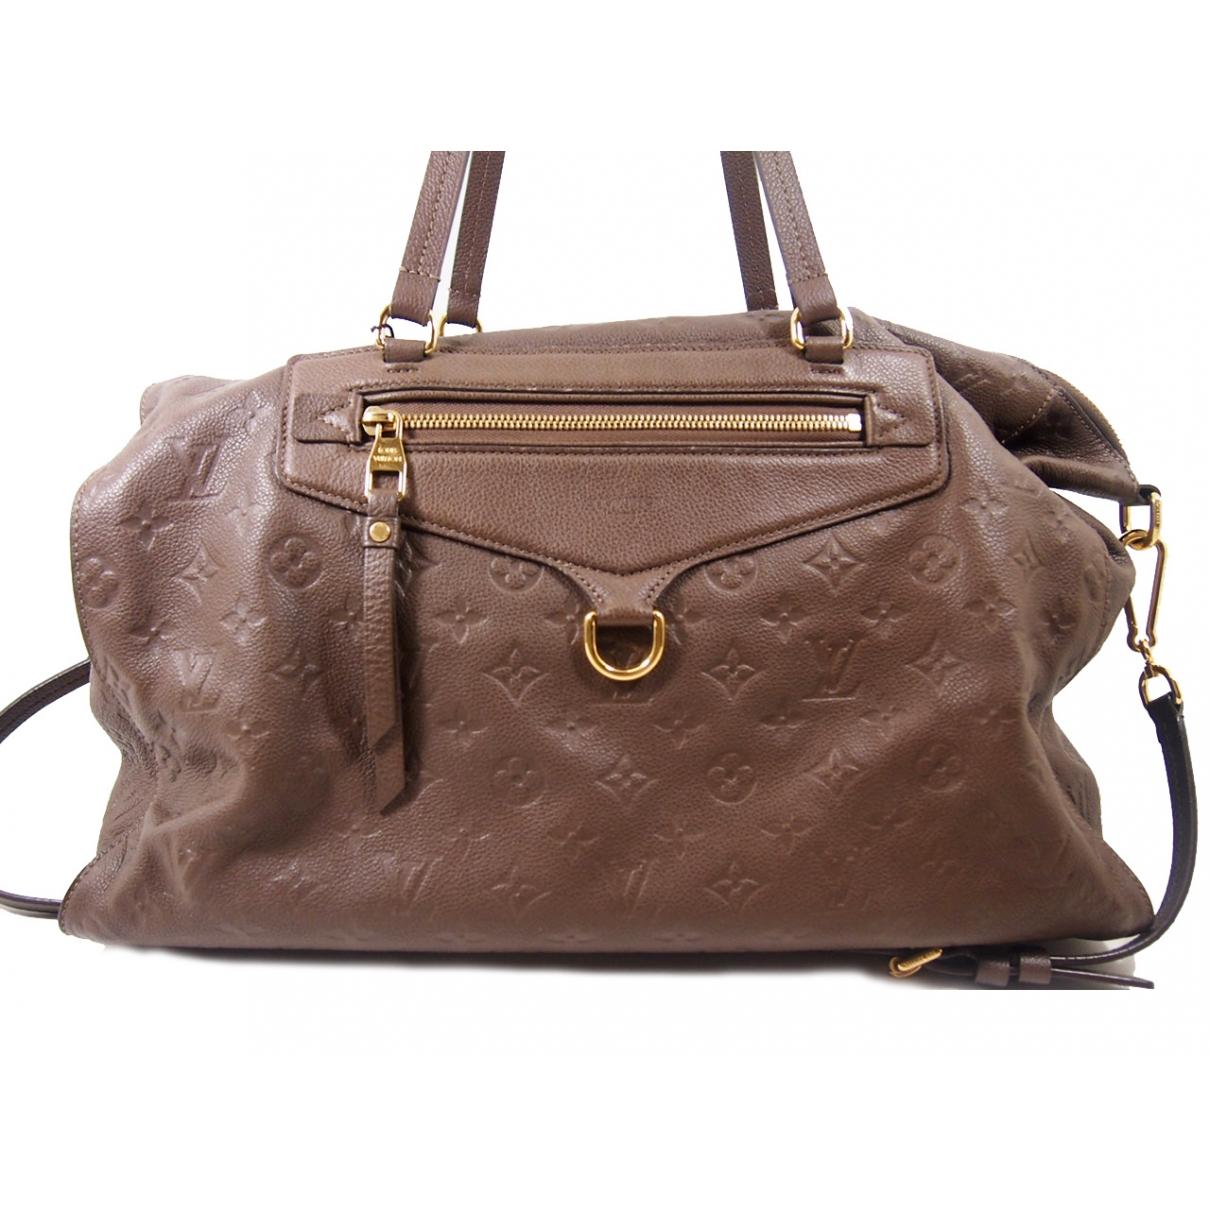 Louis Vuitton Lumineuse Handtasche in  Braun Leder